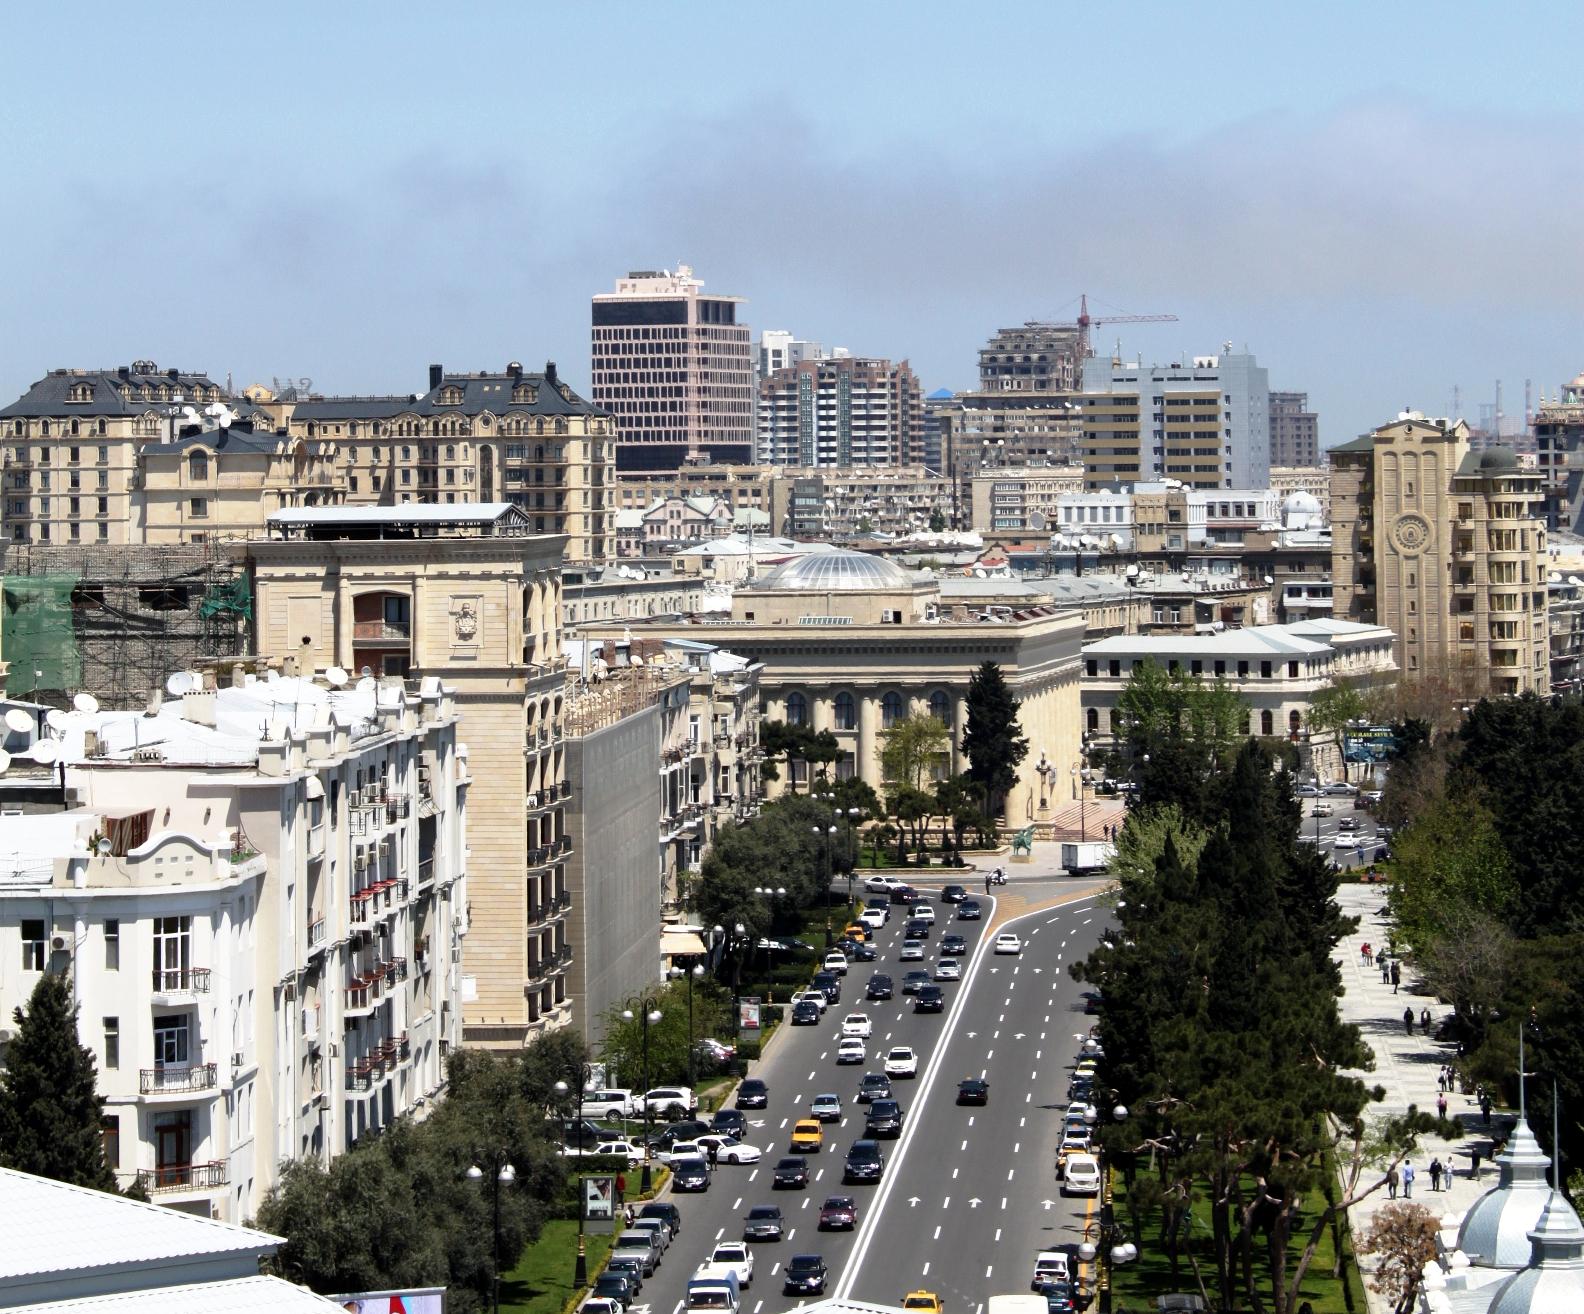 Neftchiler_Avenue,_Baku,_2010_(2).jpg